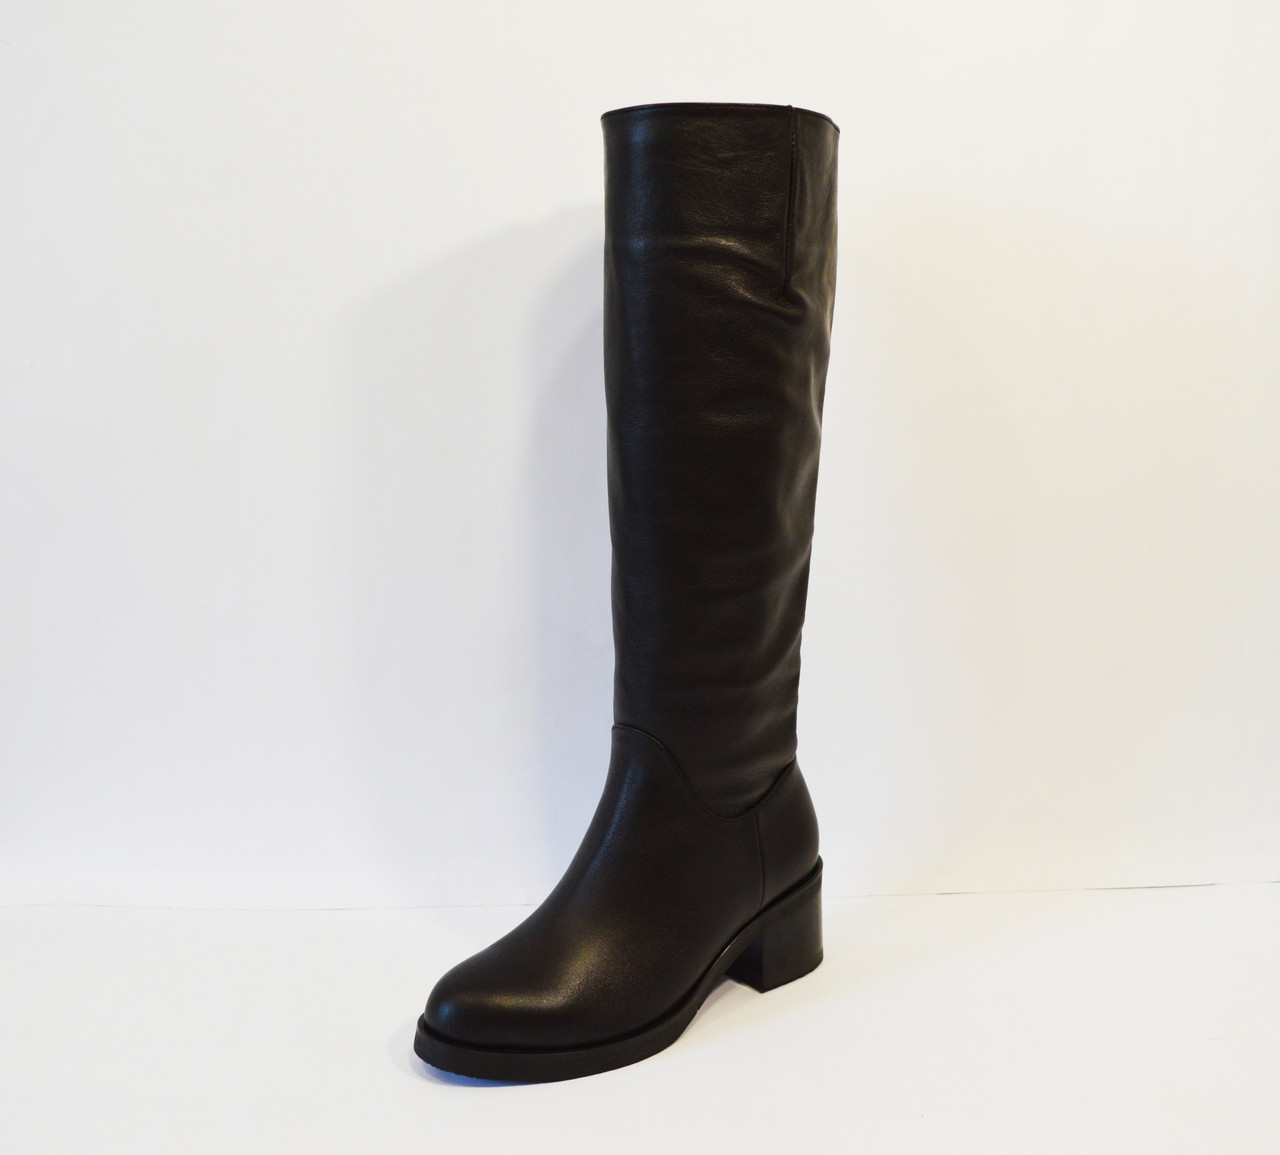 Сапоги женские кожаные Kluchini 3892